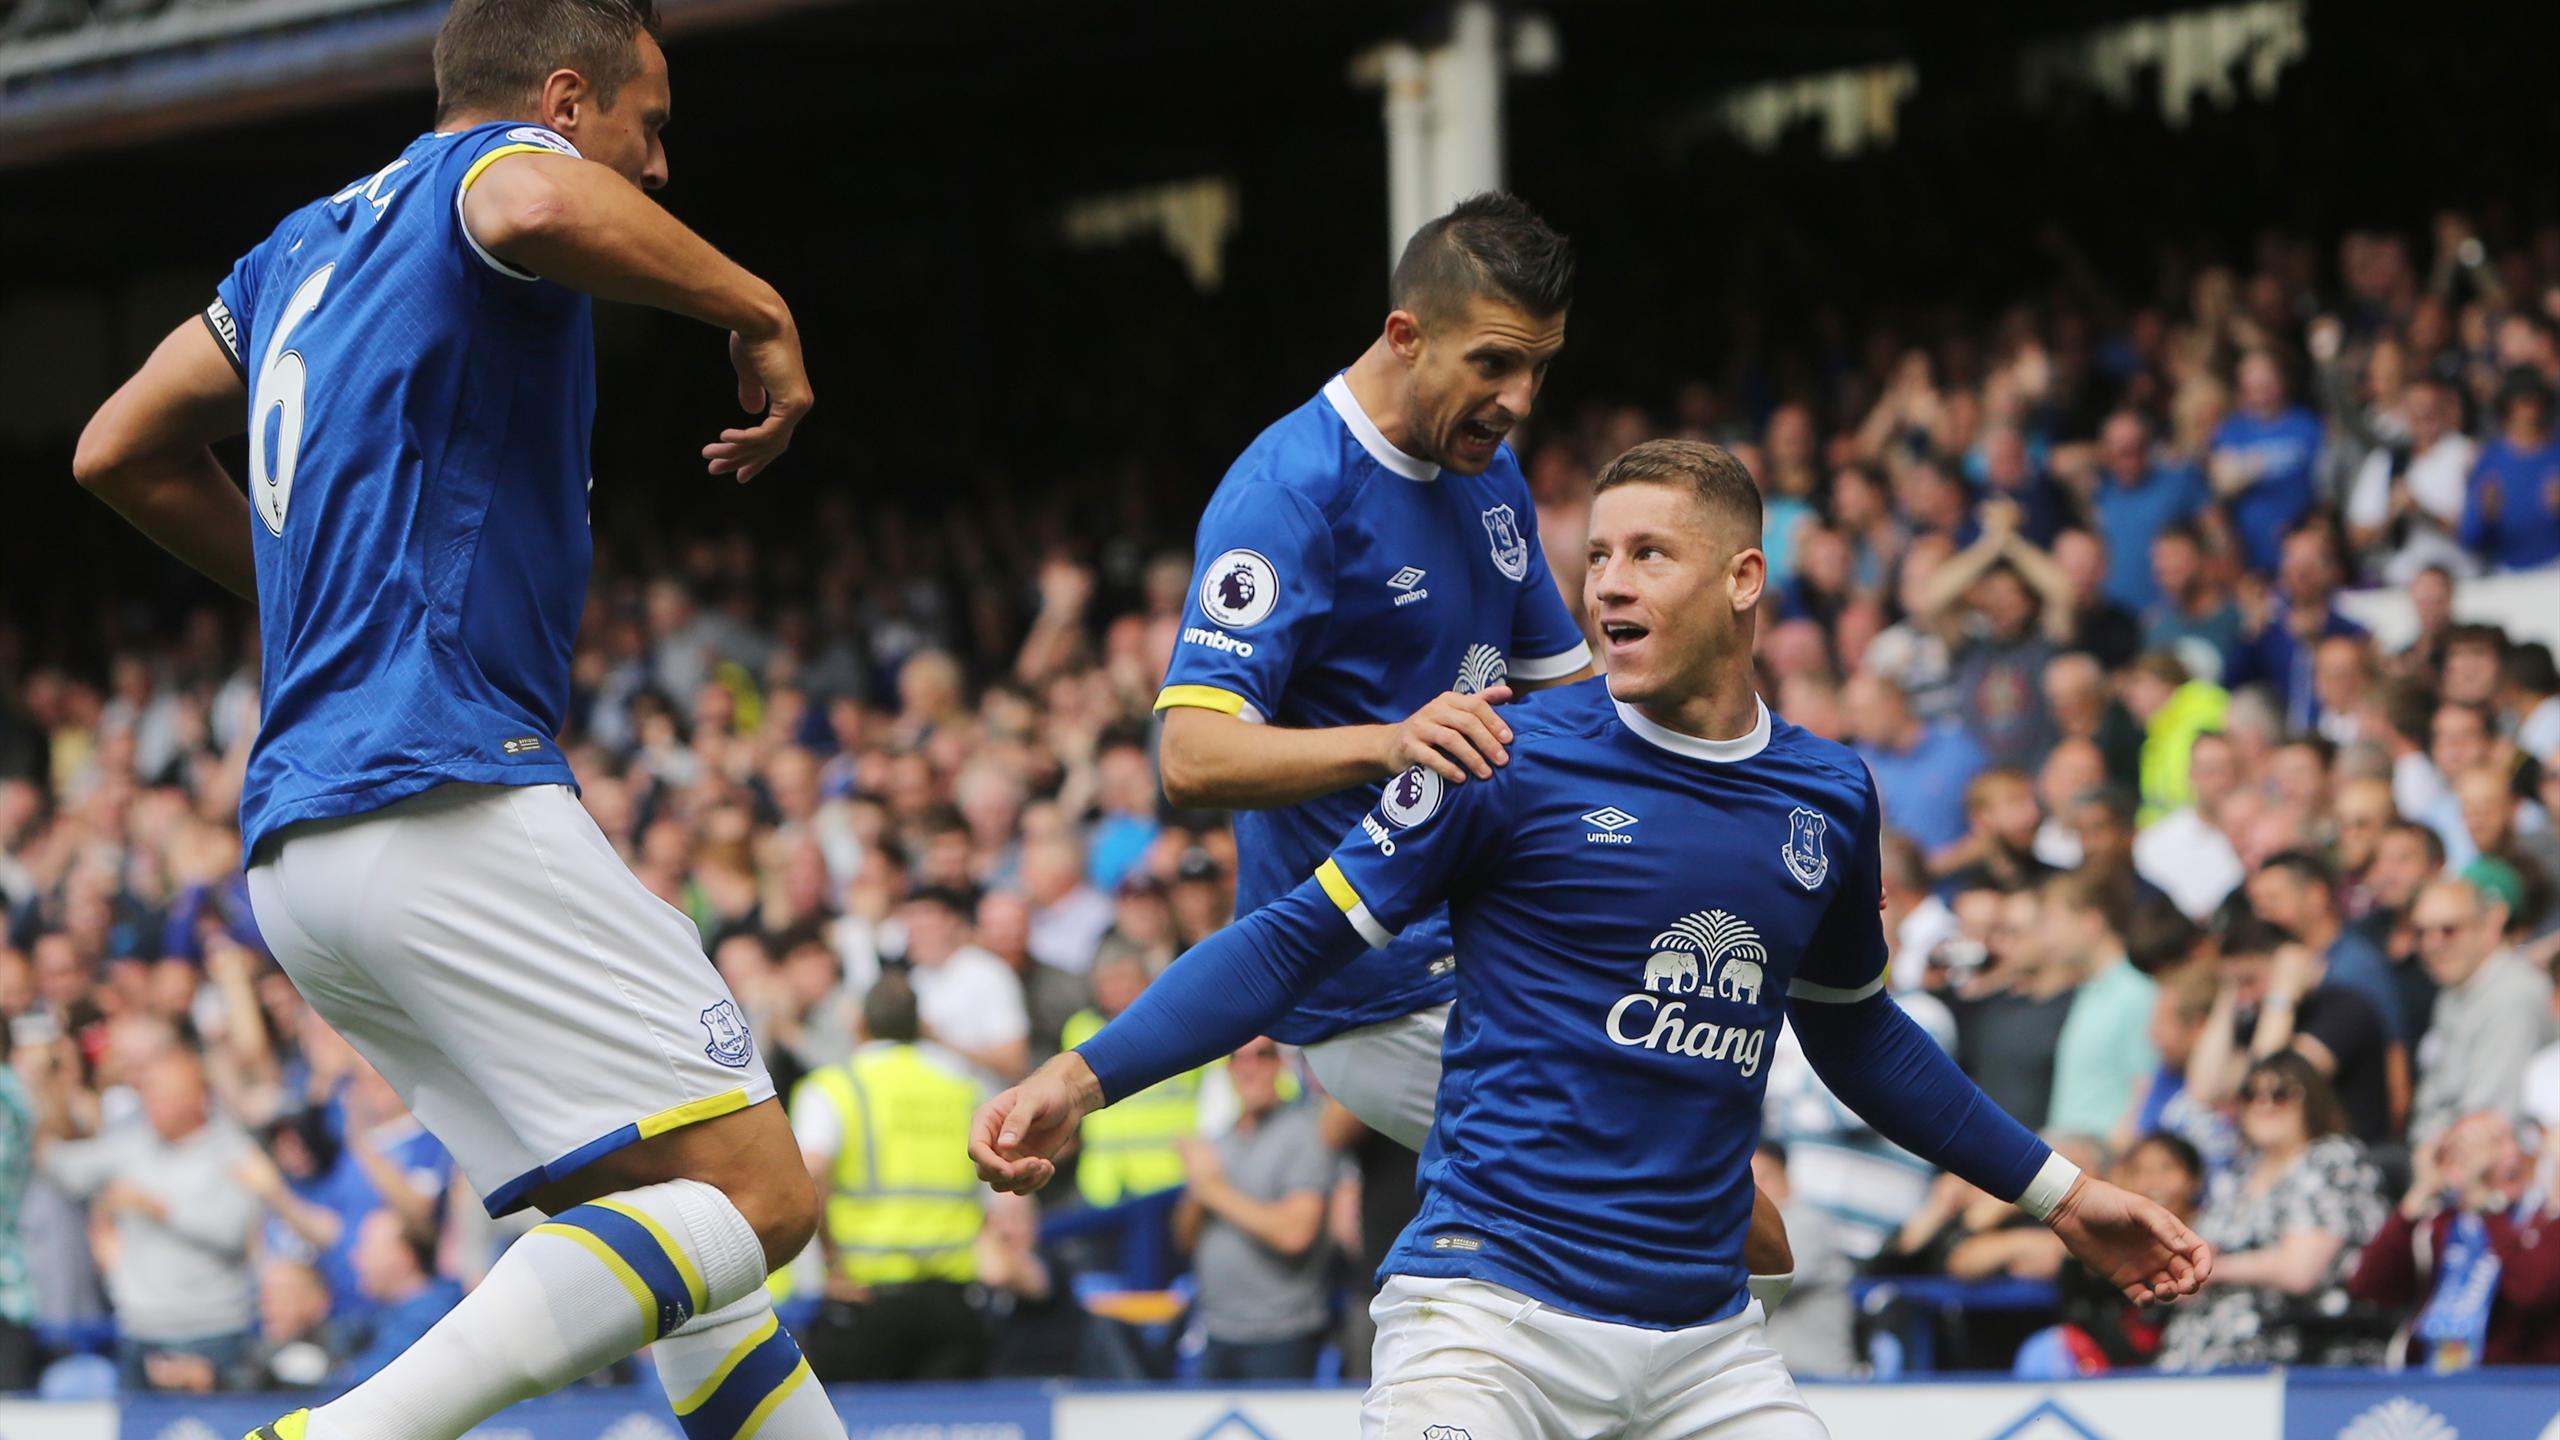 Everton's English midfielder Ross Barkley (R) celebrates scoring the opening goal